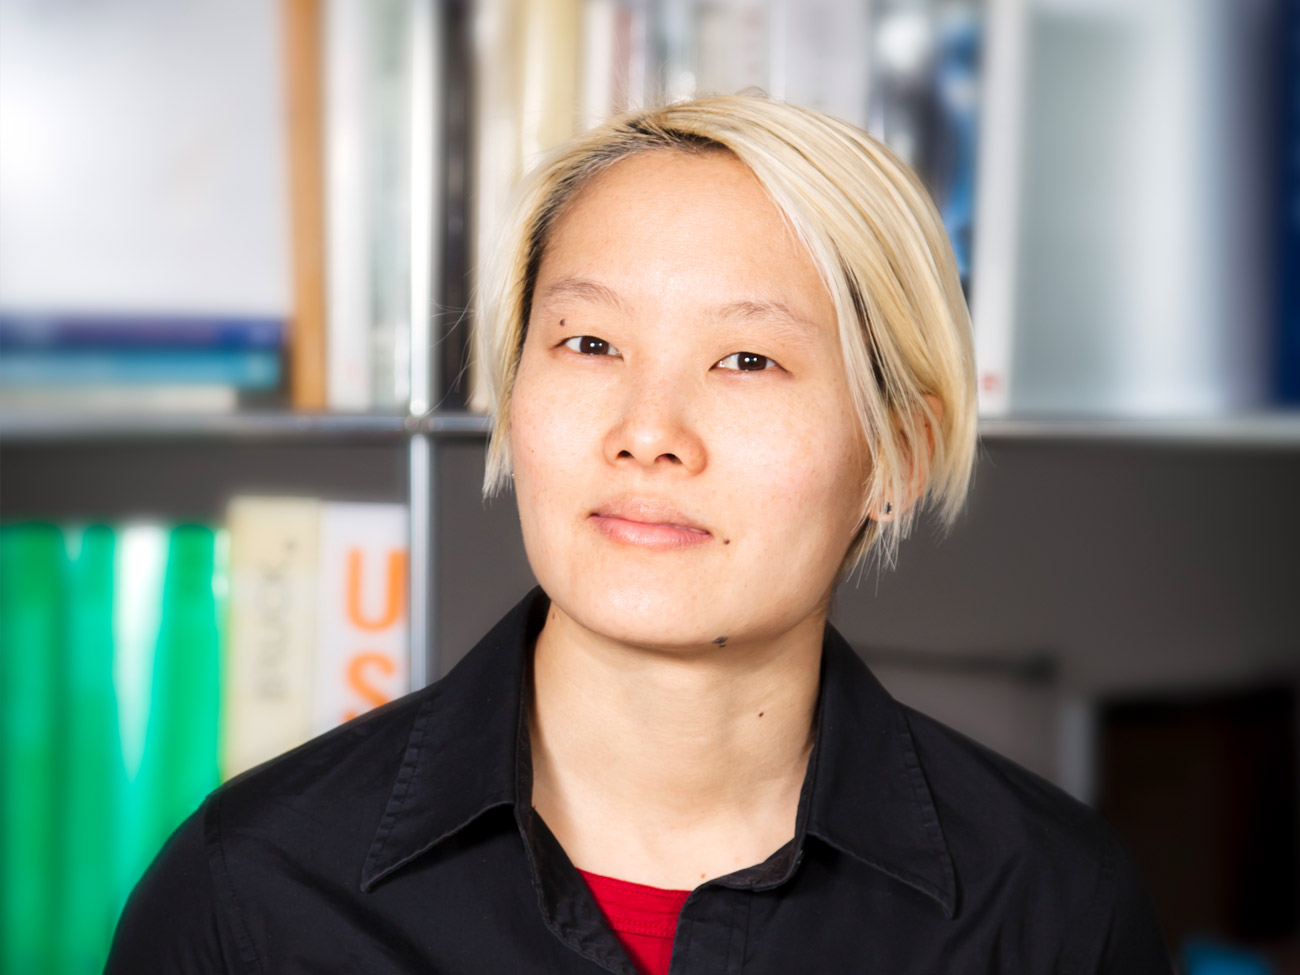 Yvonne Choy-Senior Associate, Project Architect 1